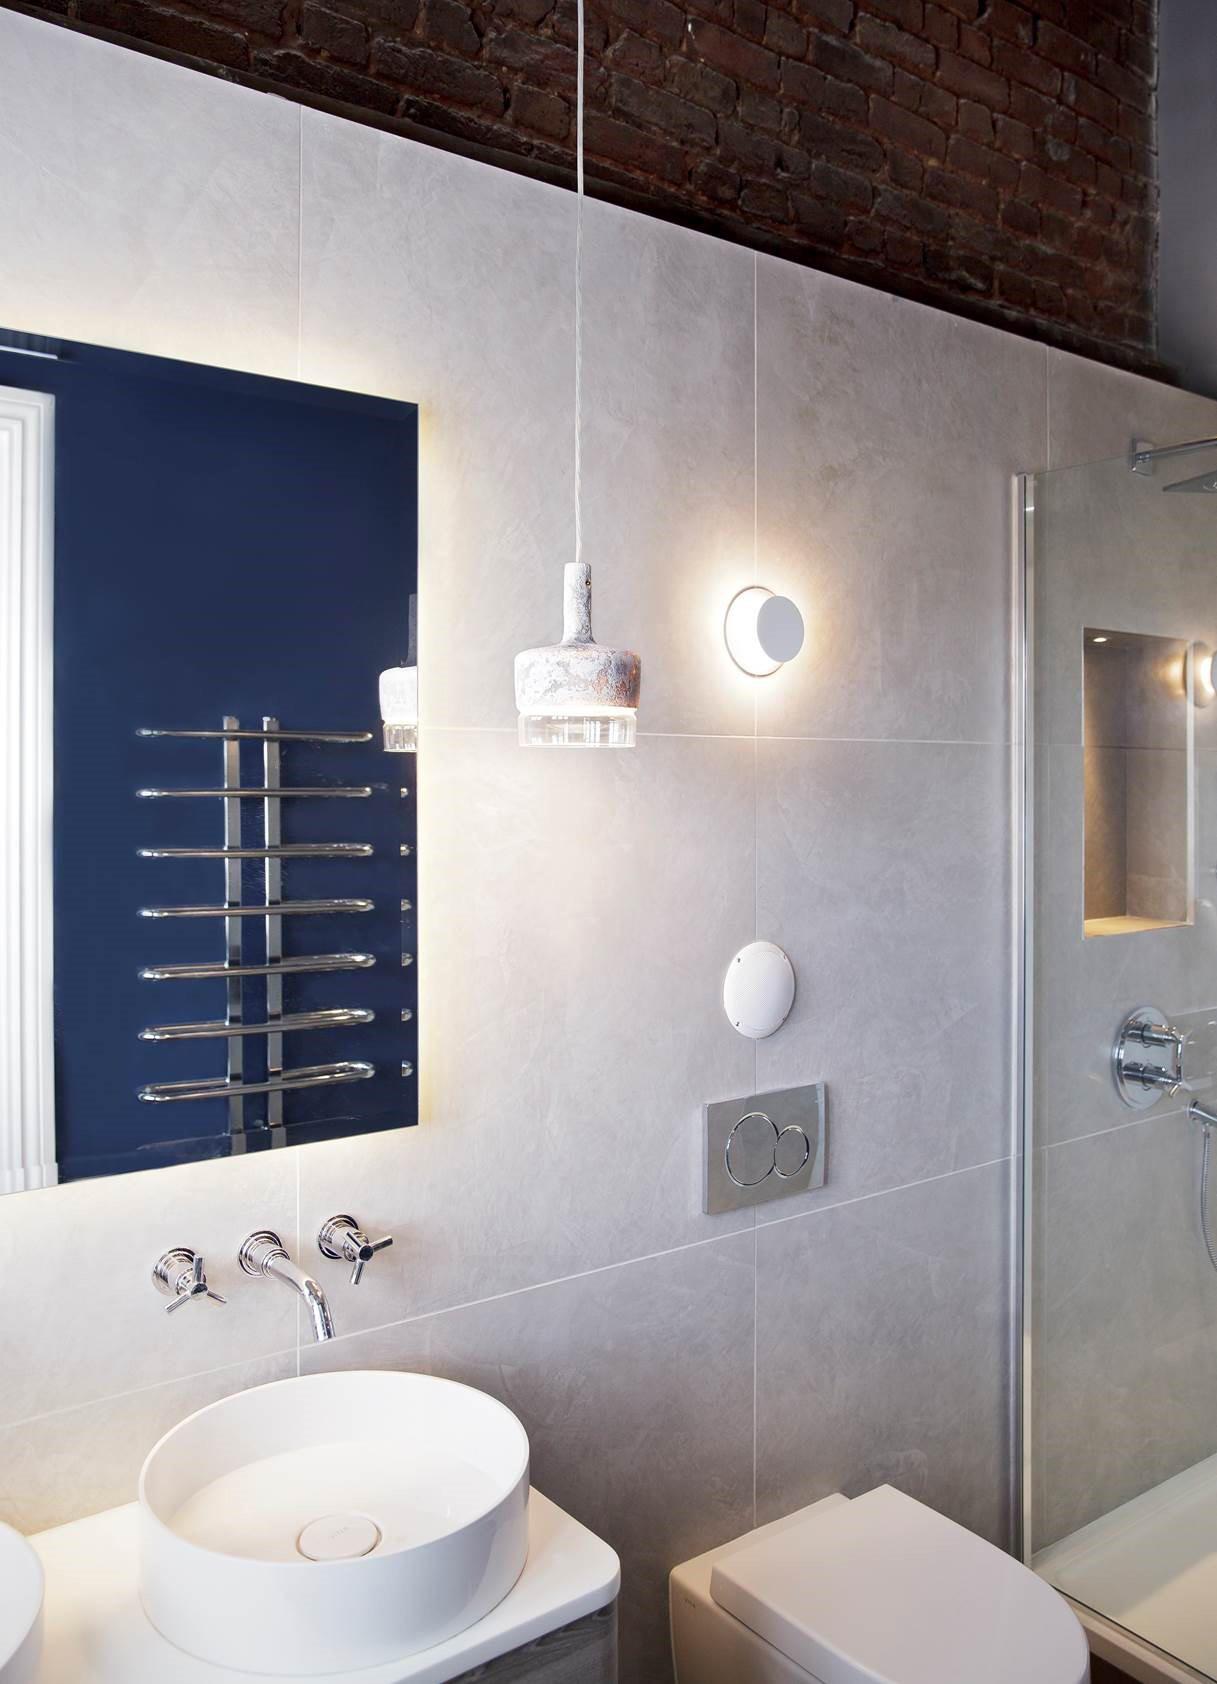 Acorn bathroom furniture -  Acorn Pendant By Penta